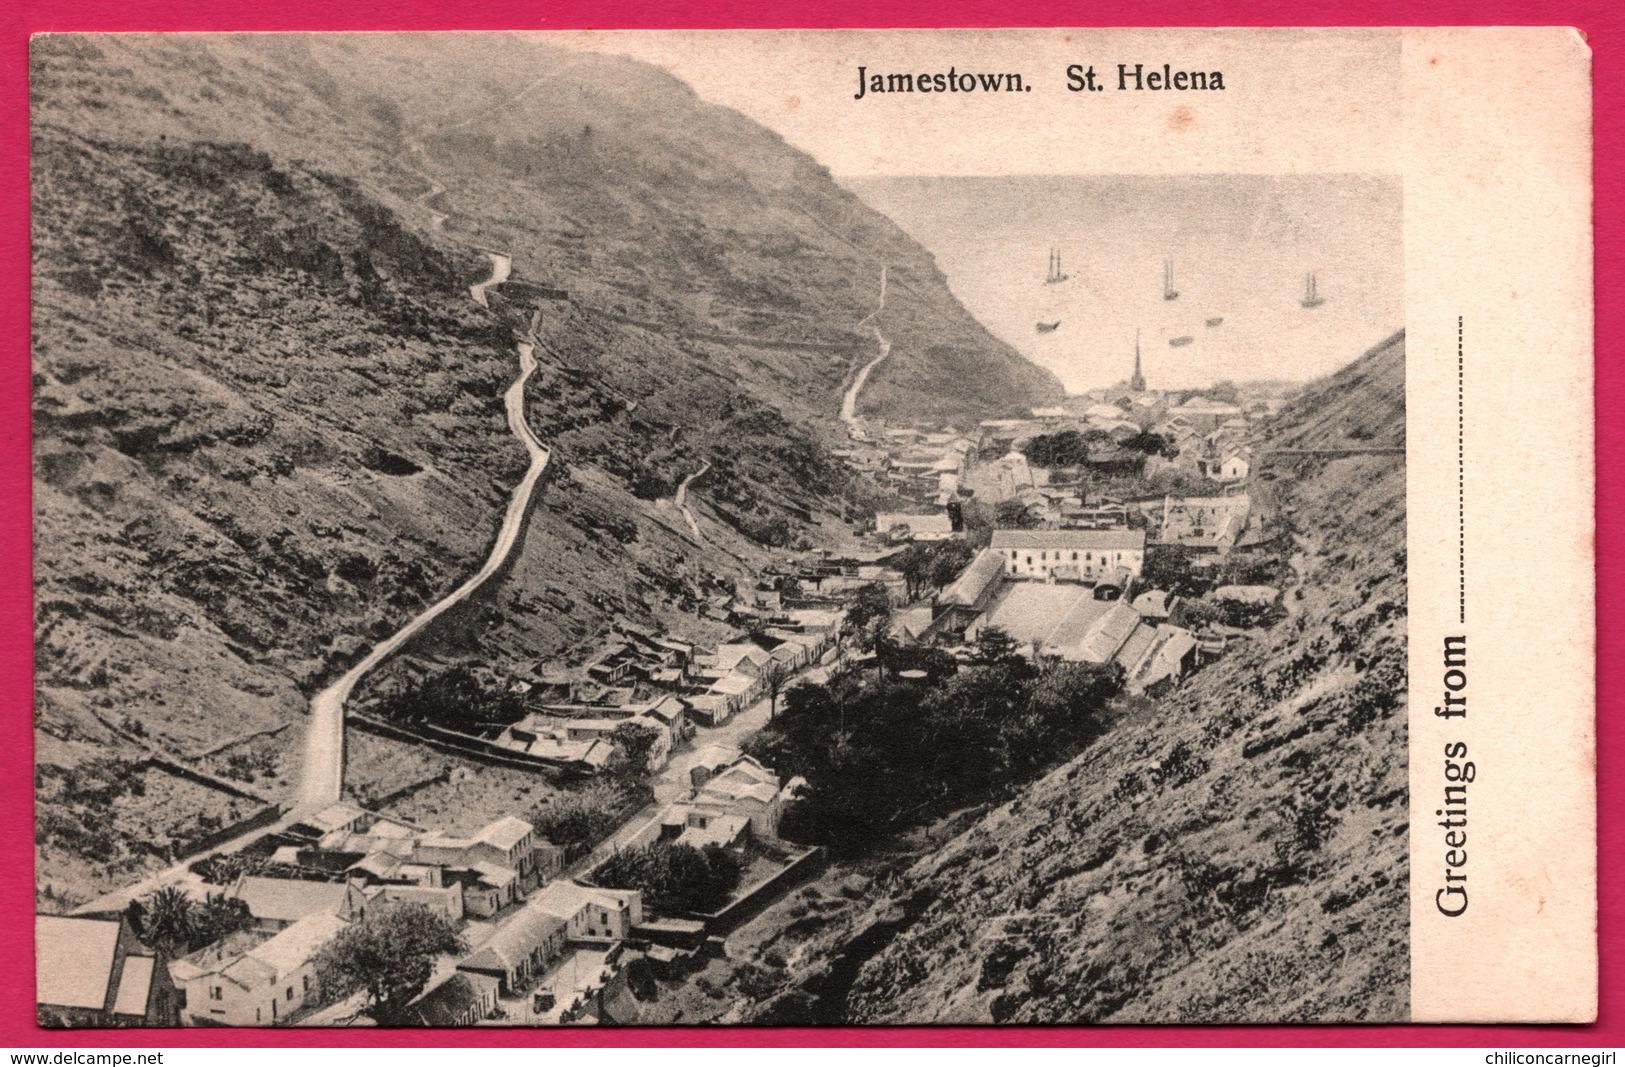 Greetings From St. Helena - Jamestown - T. JACKSON - Saint Helena Island